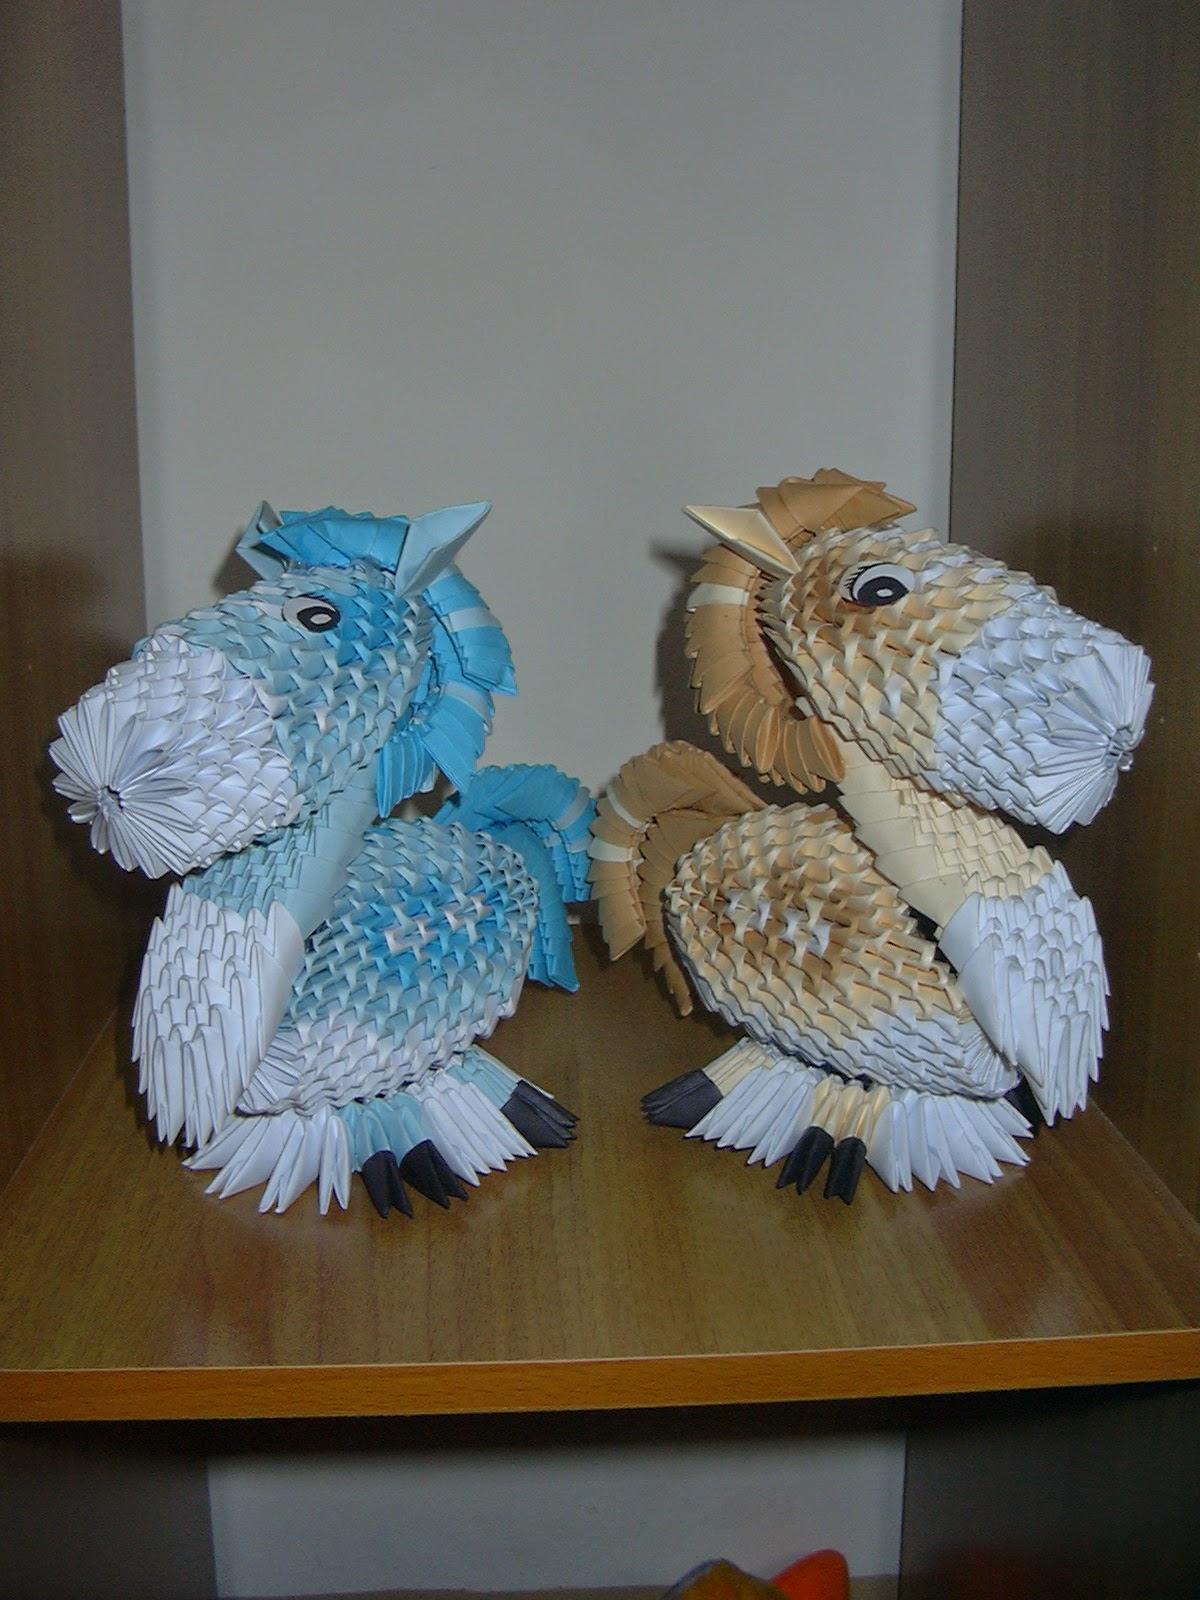 ICHANOKO 3D ORIGAMI INDONESIA: Model 3d origami - ANIMALS - photo#30